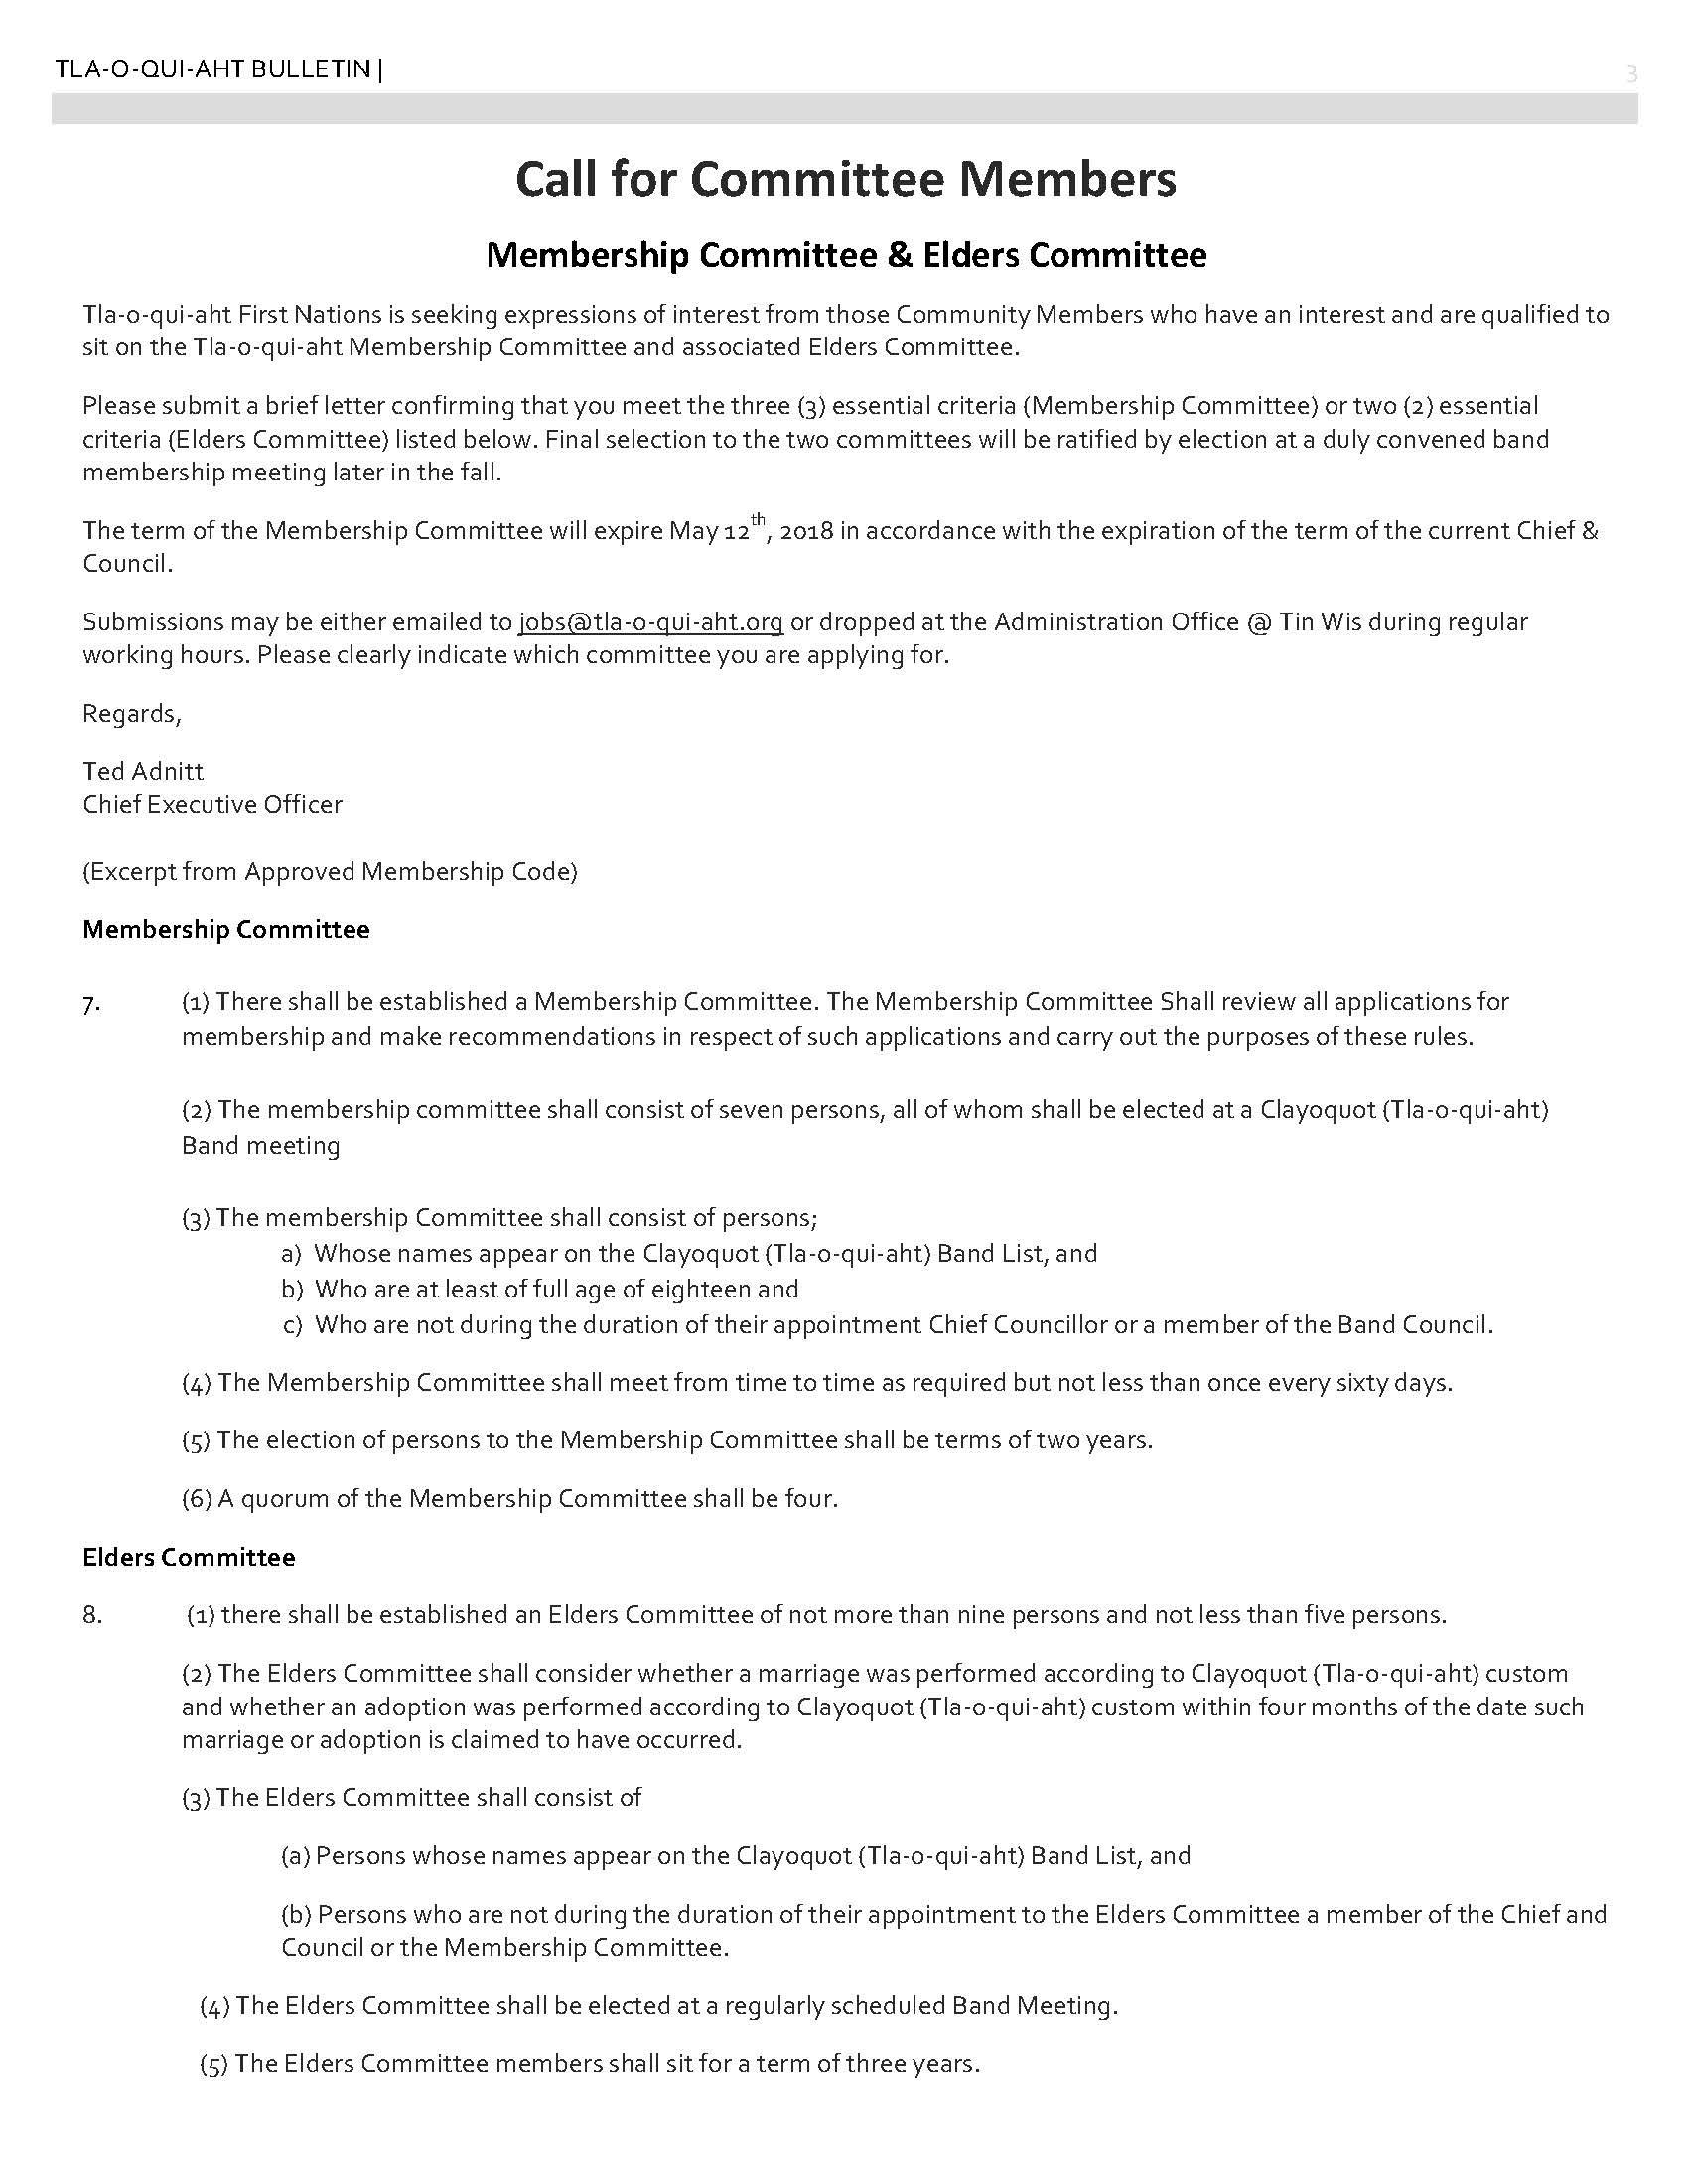 0TFN Bulletin Nov 15-2016_Page_03.jpg